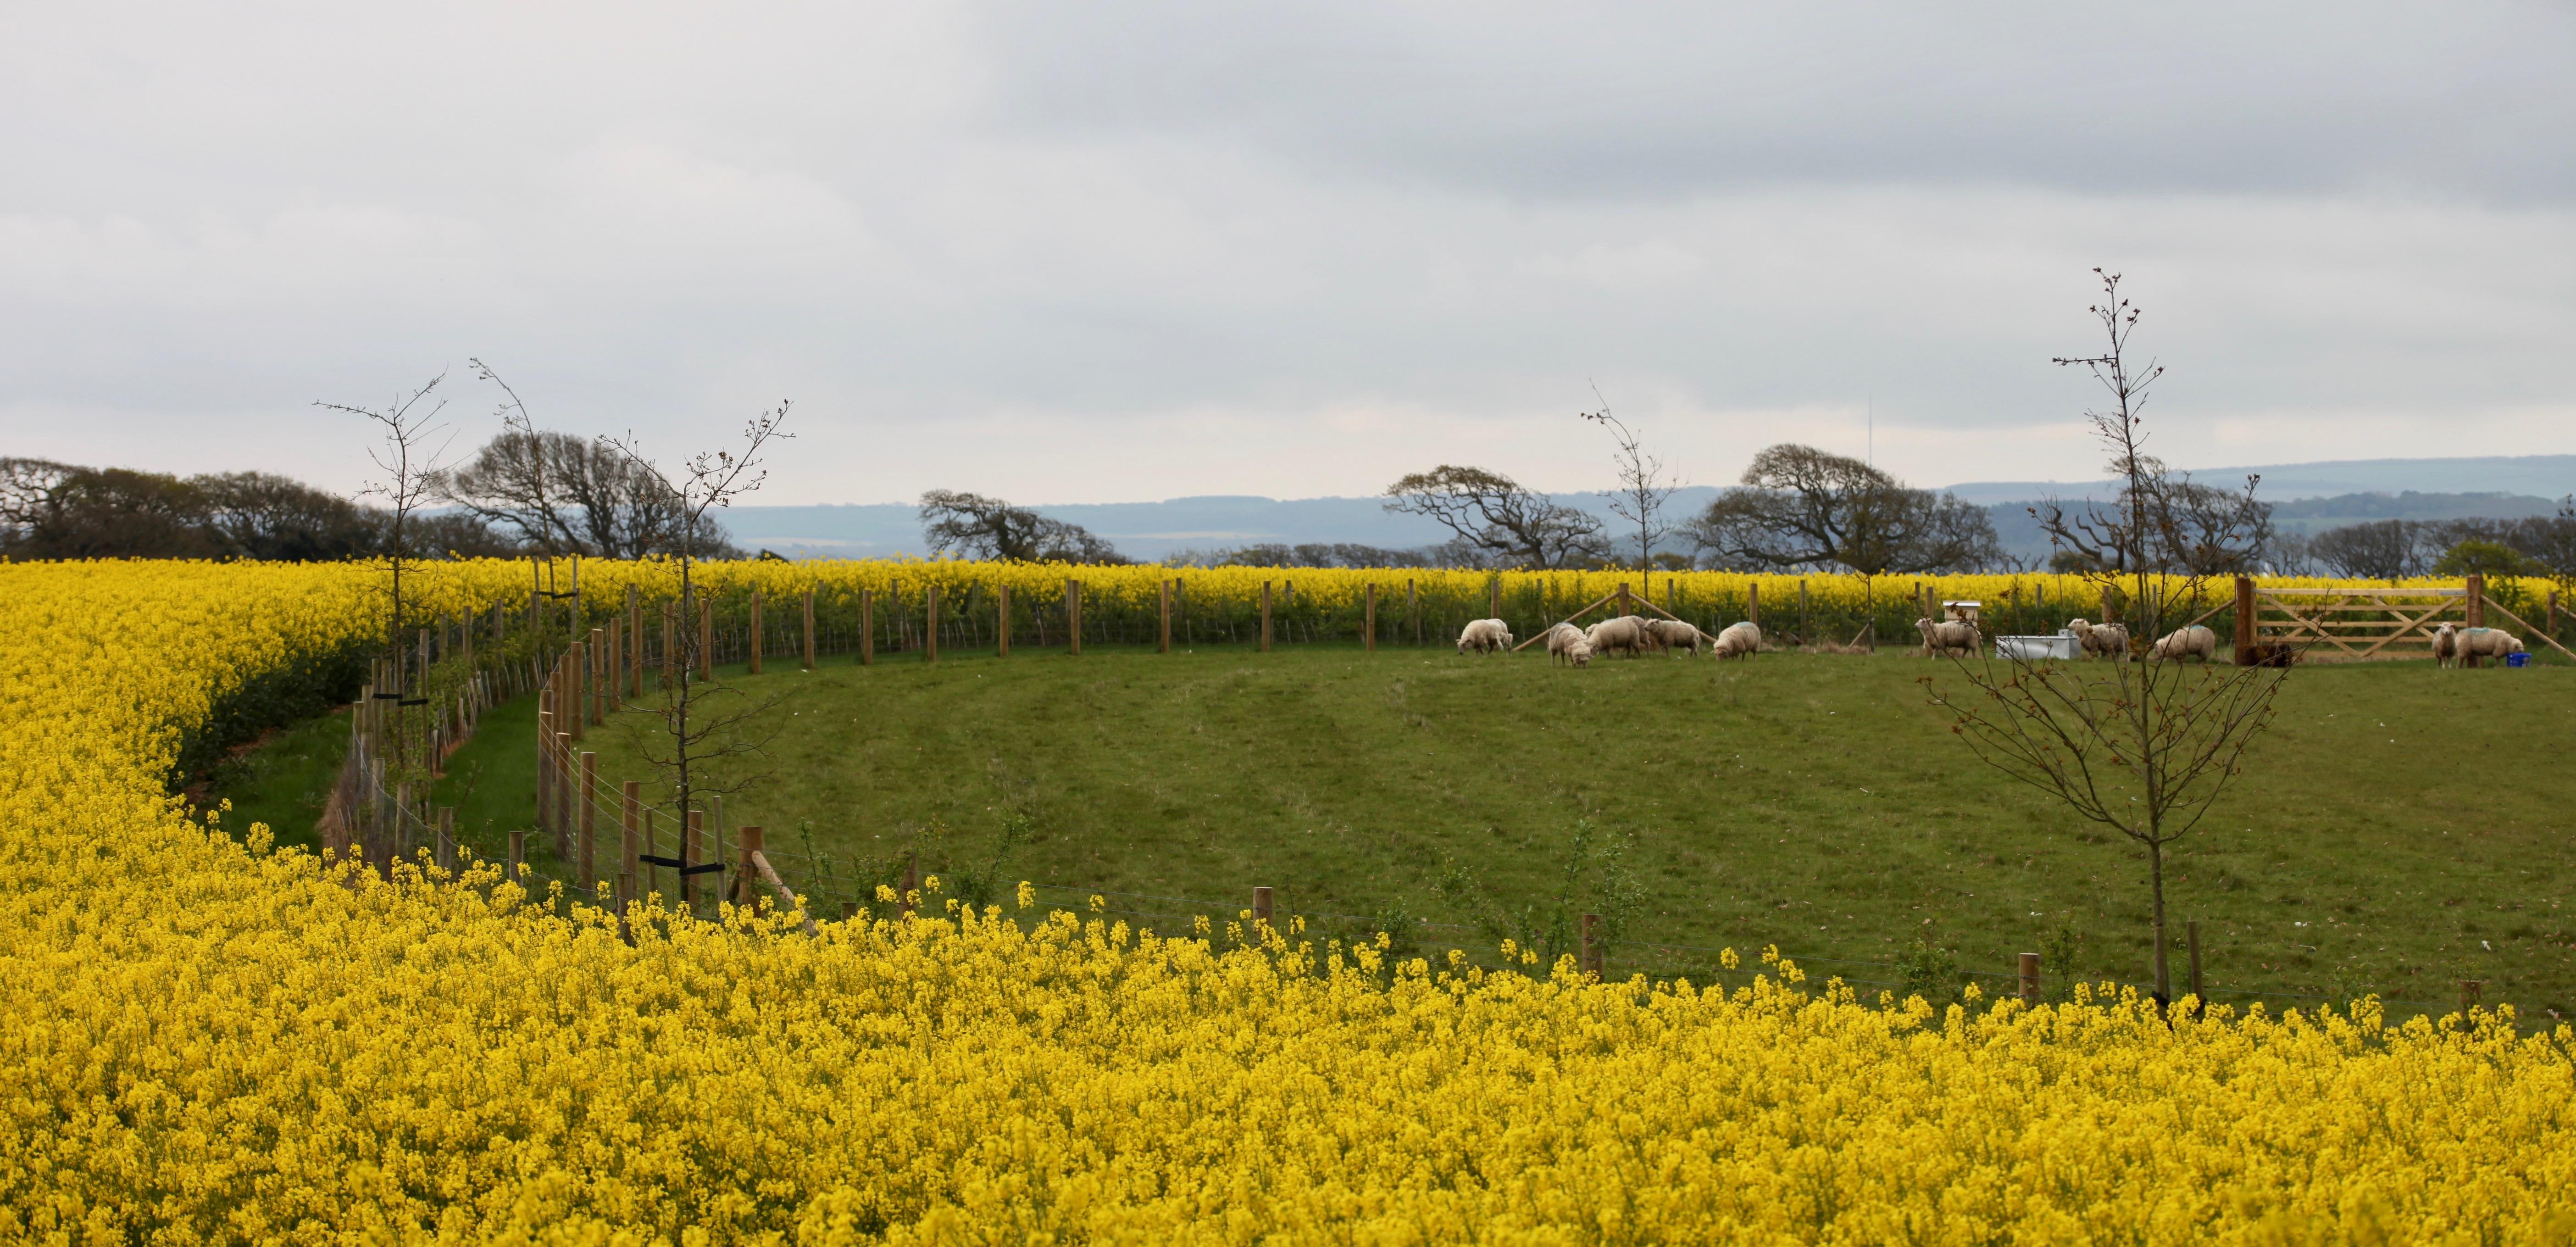 Rape field, sheep, Isle of Wight